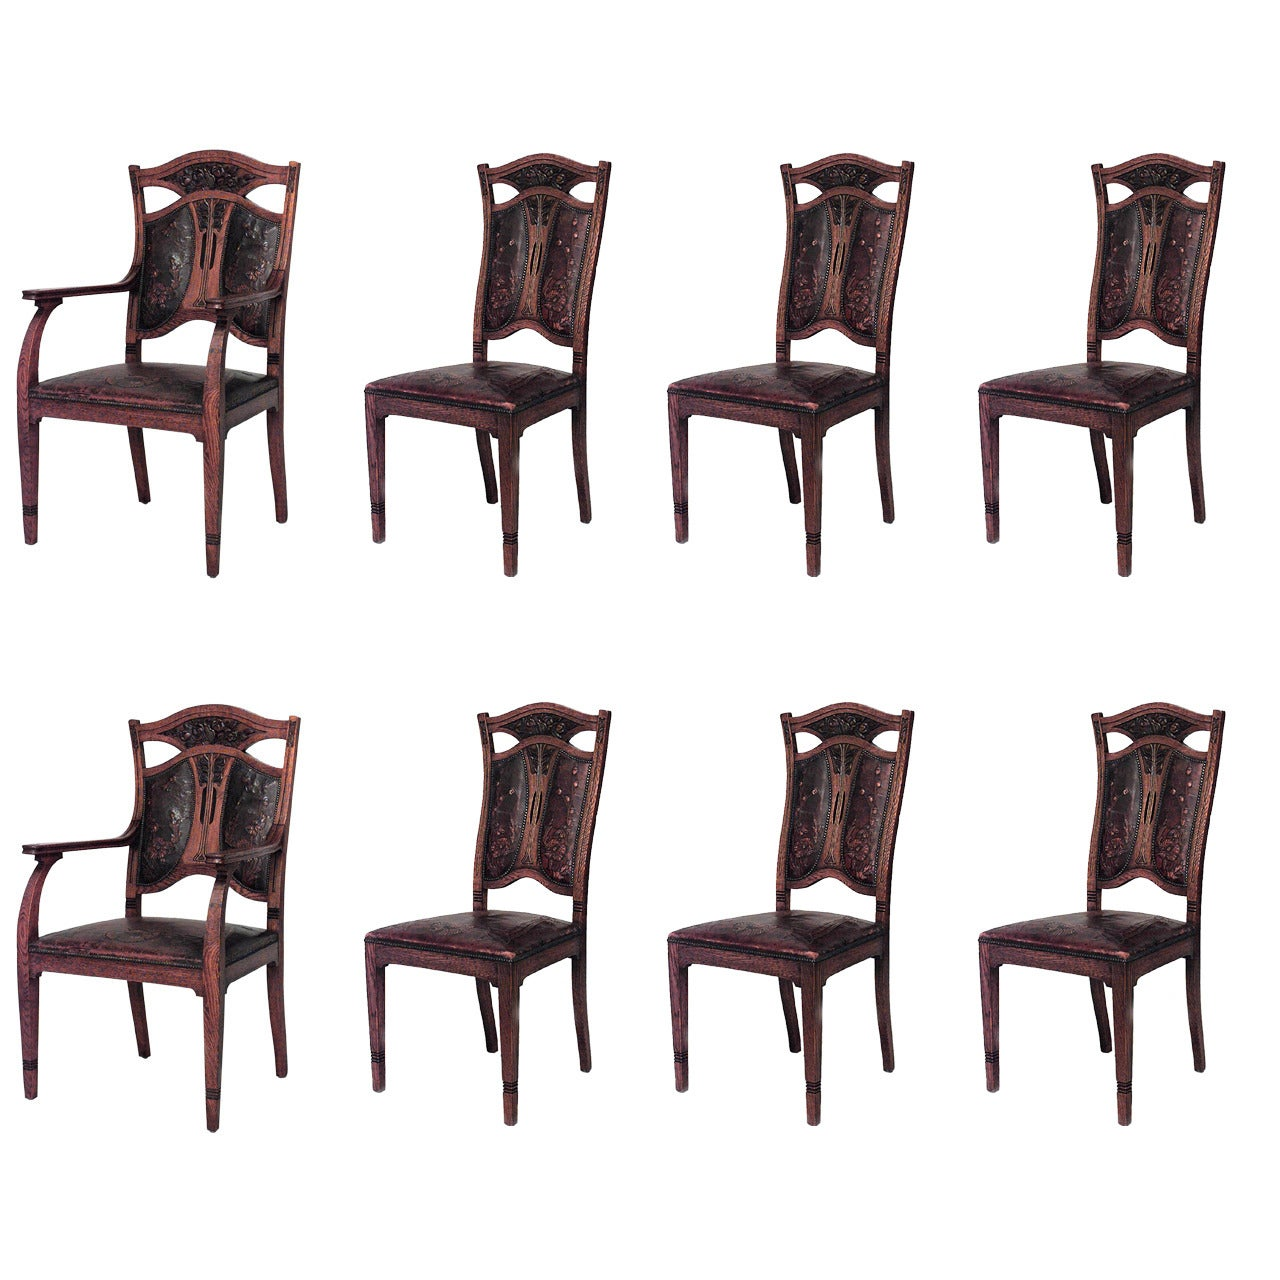 Set of 8 Belgian Art Nouveau Leather Chairs